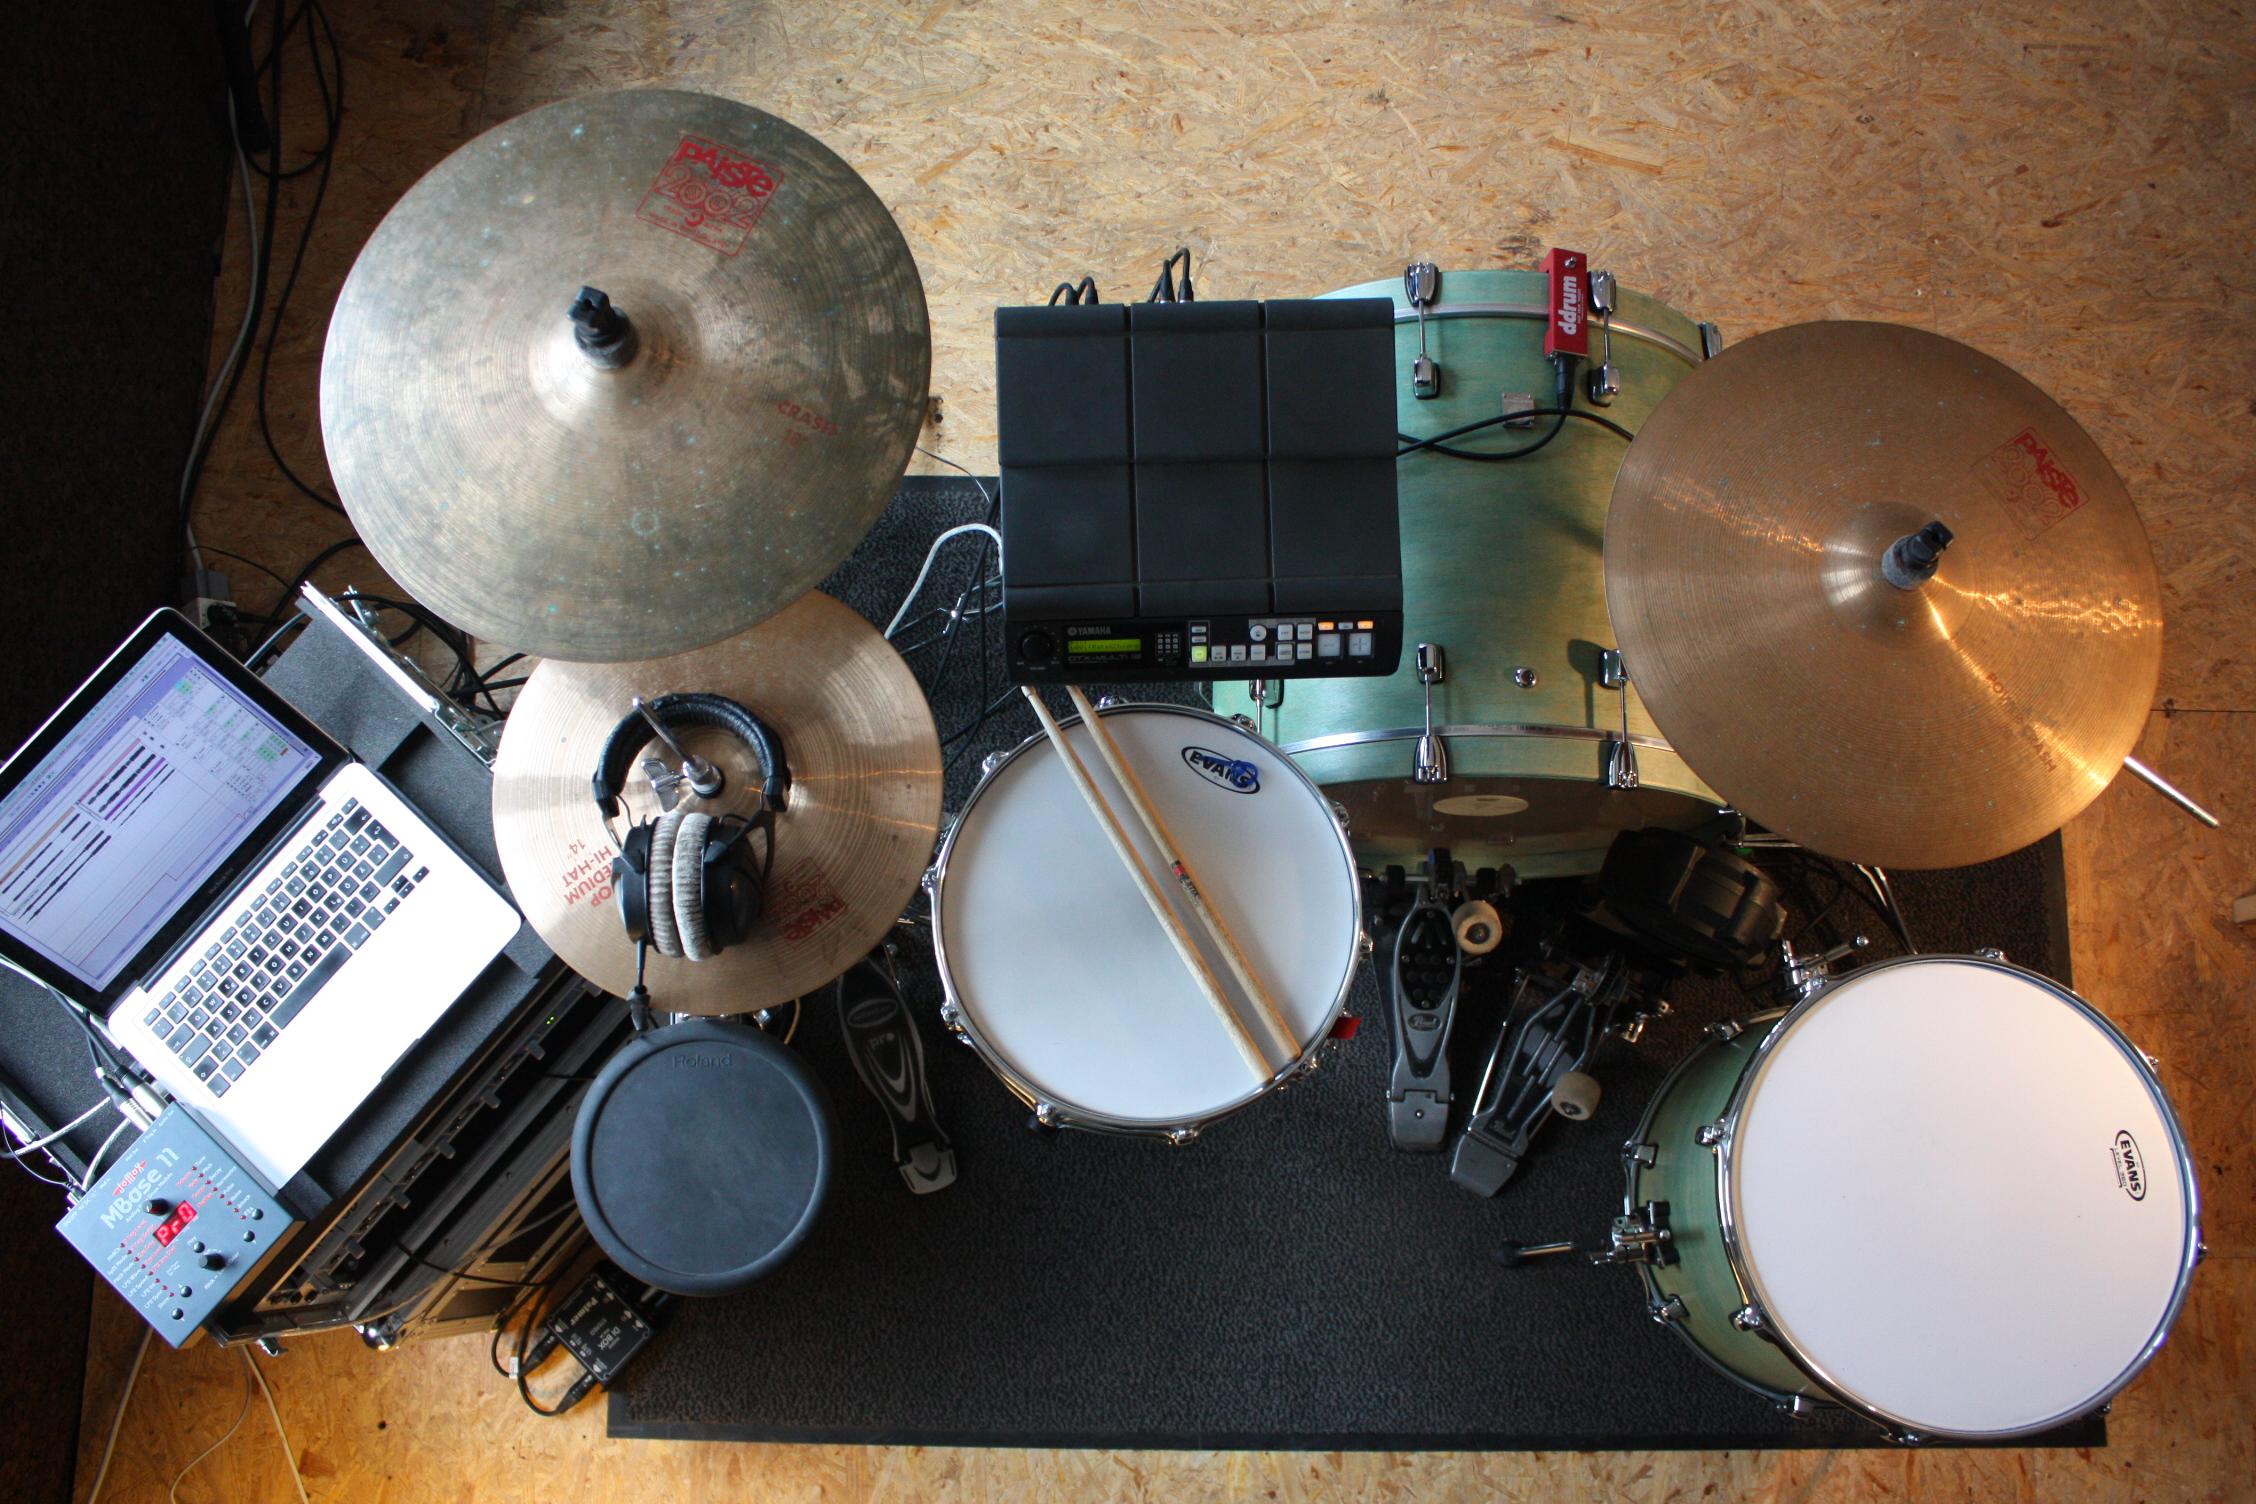 Hybrid Drumset